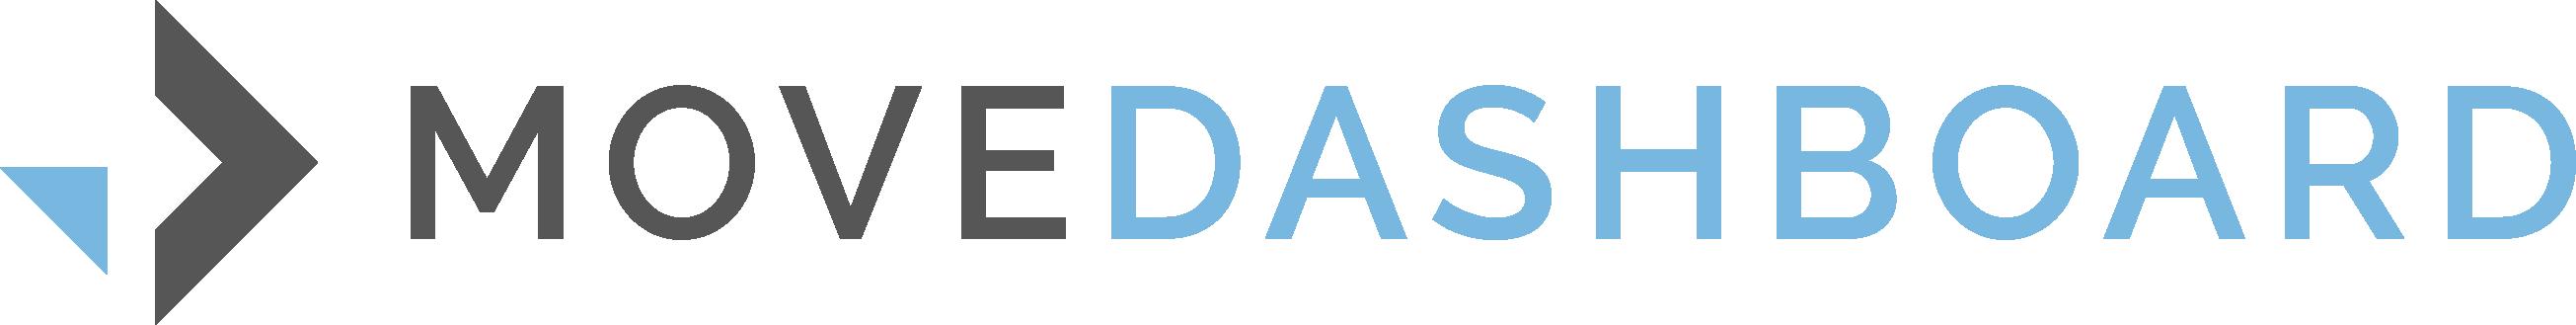 MoveDashboard logo